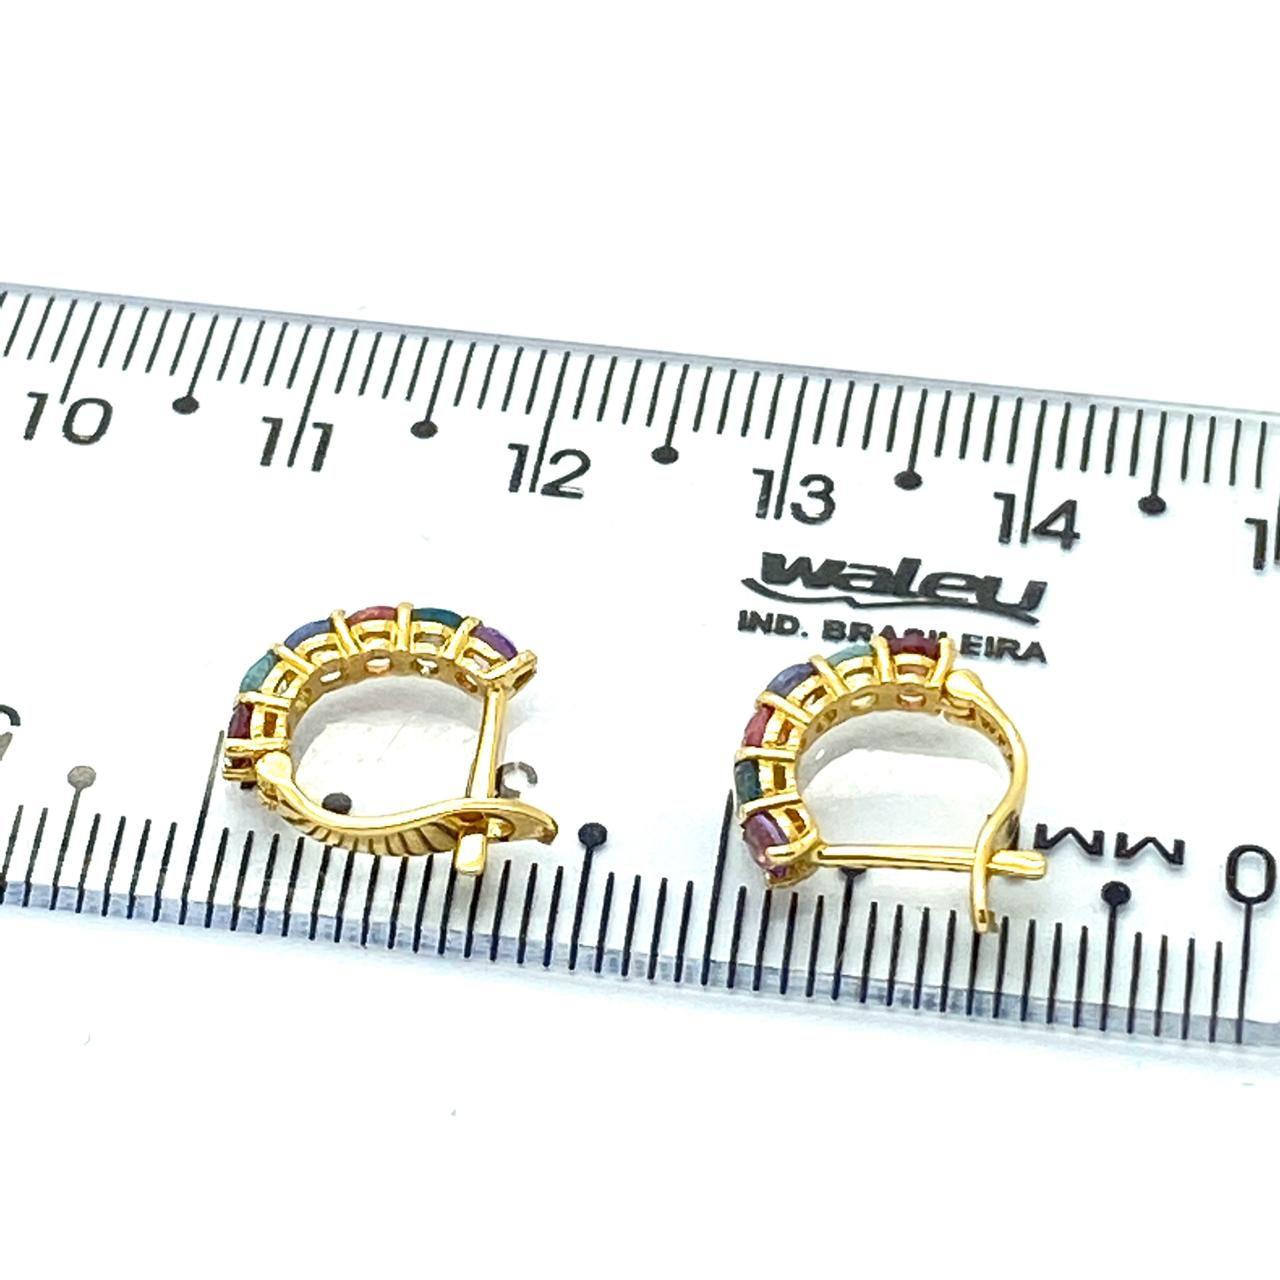 Brinco Argola Ouro Maciço 18k 7mm 12 Pedra Natural Colorida